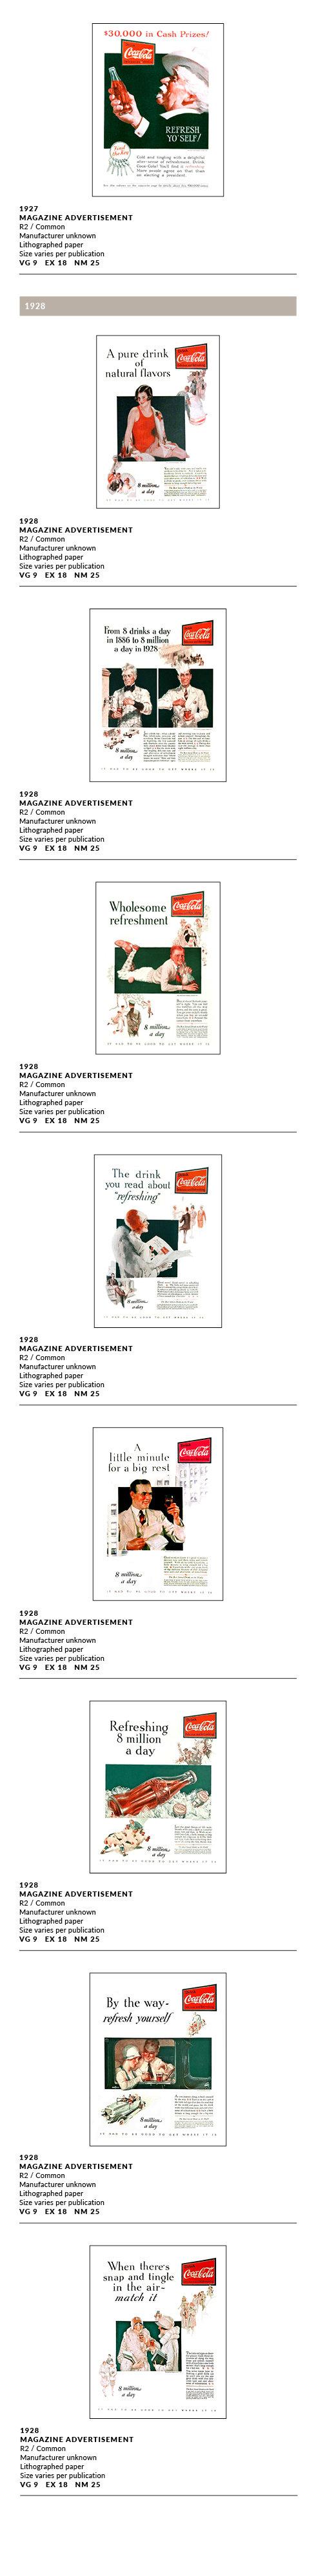 1925-29 Ads_5.jpg